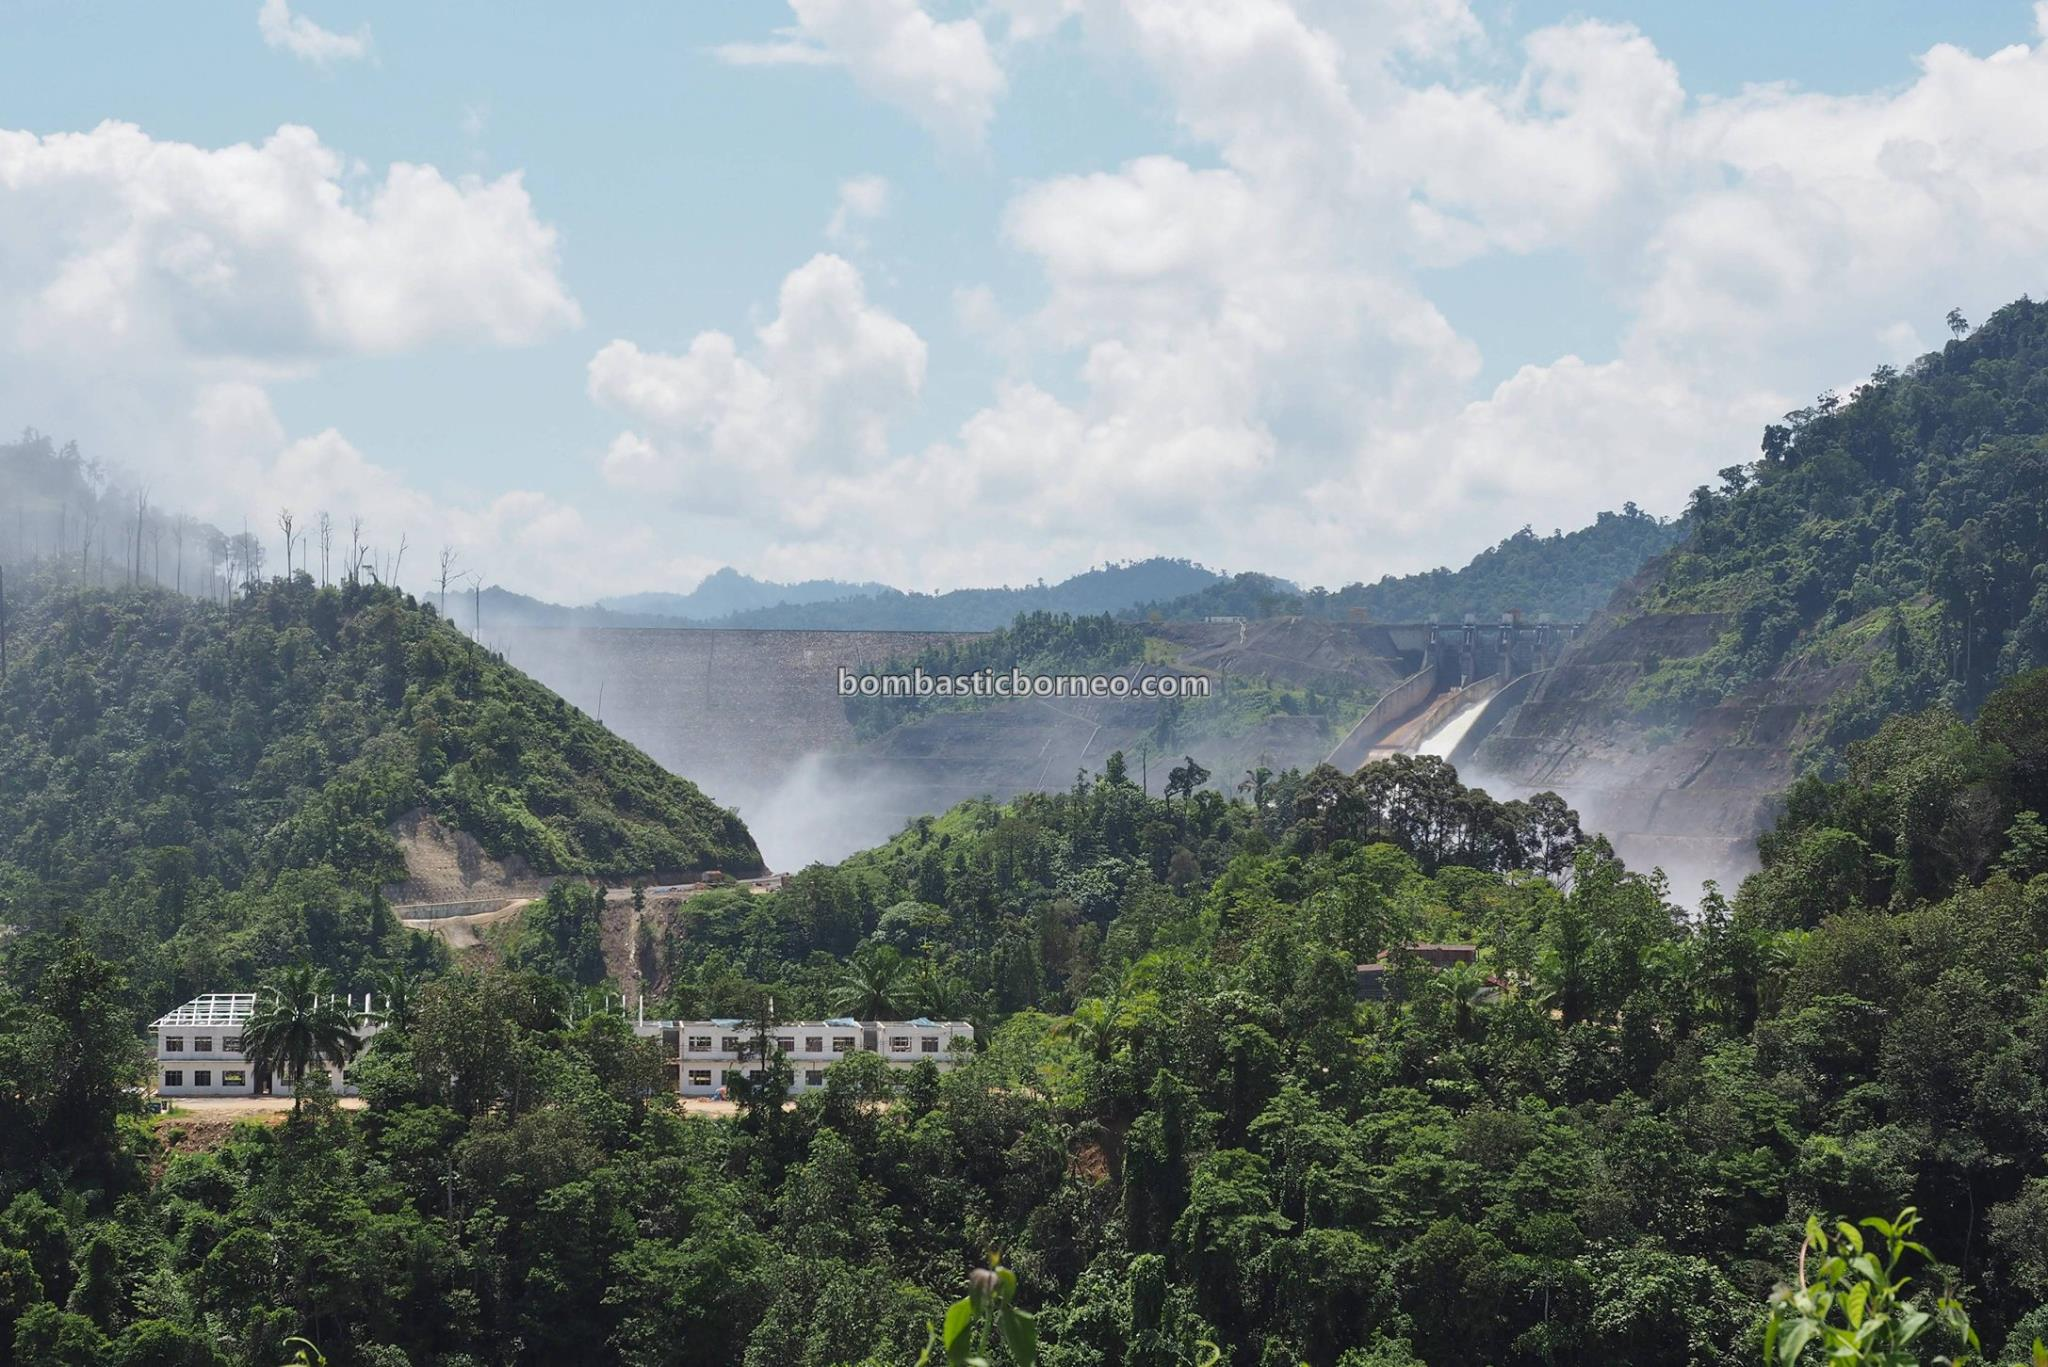 Sarawak, Bakun Hydroelectric Power Dam, Embankment Dam, empangan, backpackers, destination, Belaga, Kapit, Malaysia, Tourism, tourist attraction, travel guide, Trans Borneo, 马来西亚旅游景点